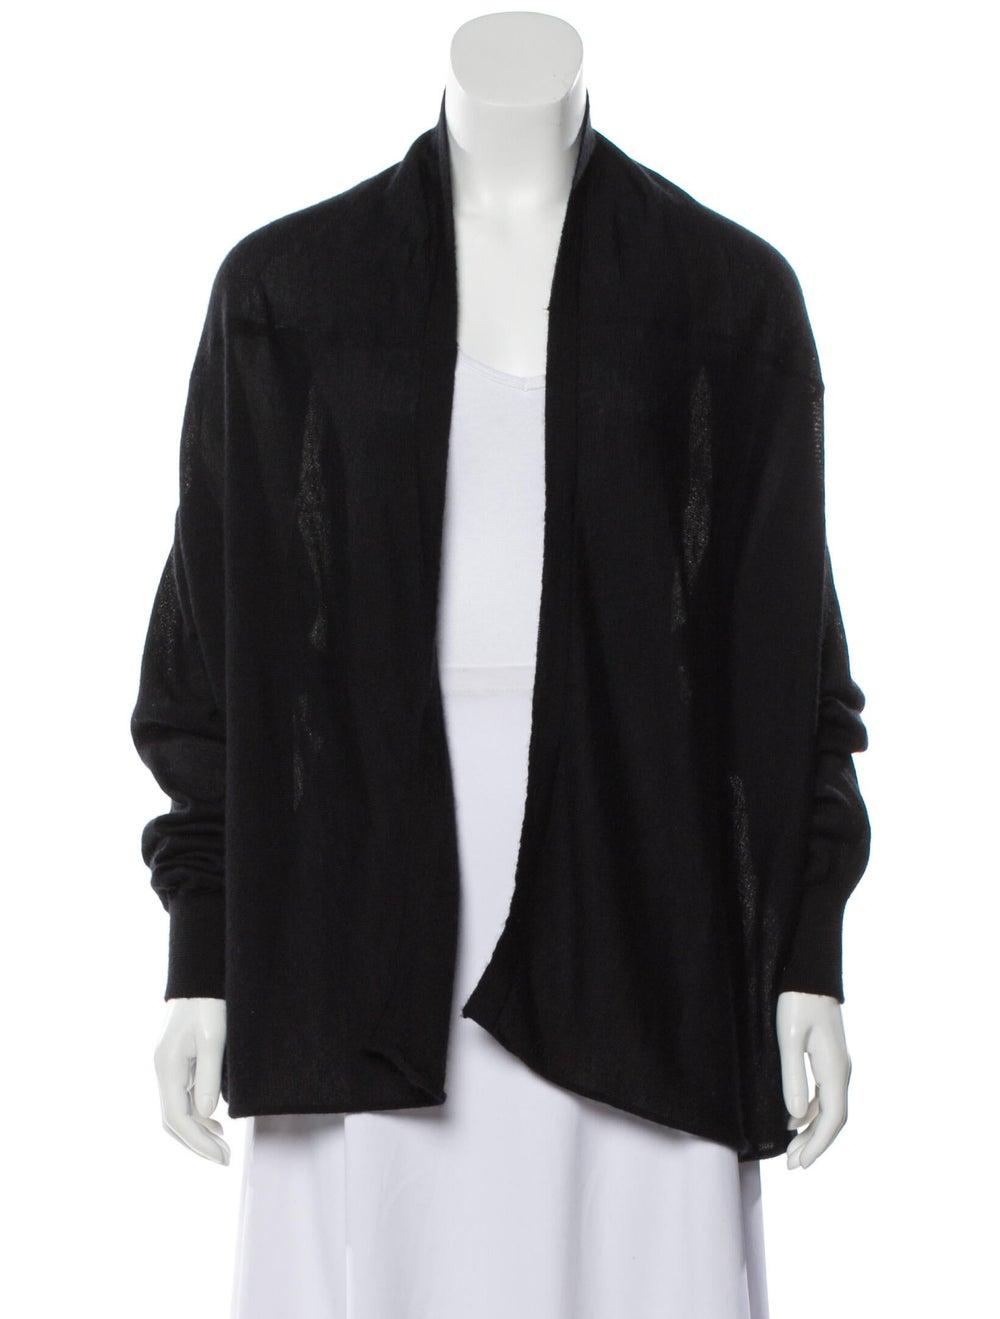 Dolce & Gabbana Cashmere and Silk-Blend Knit Black - image 1